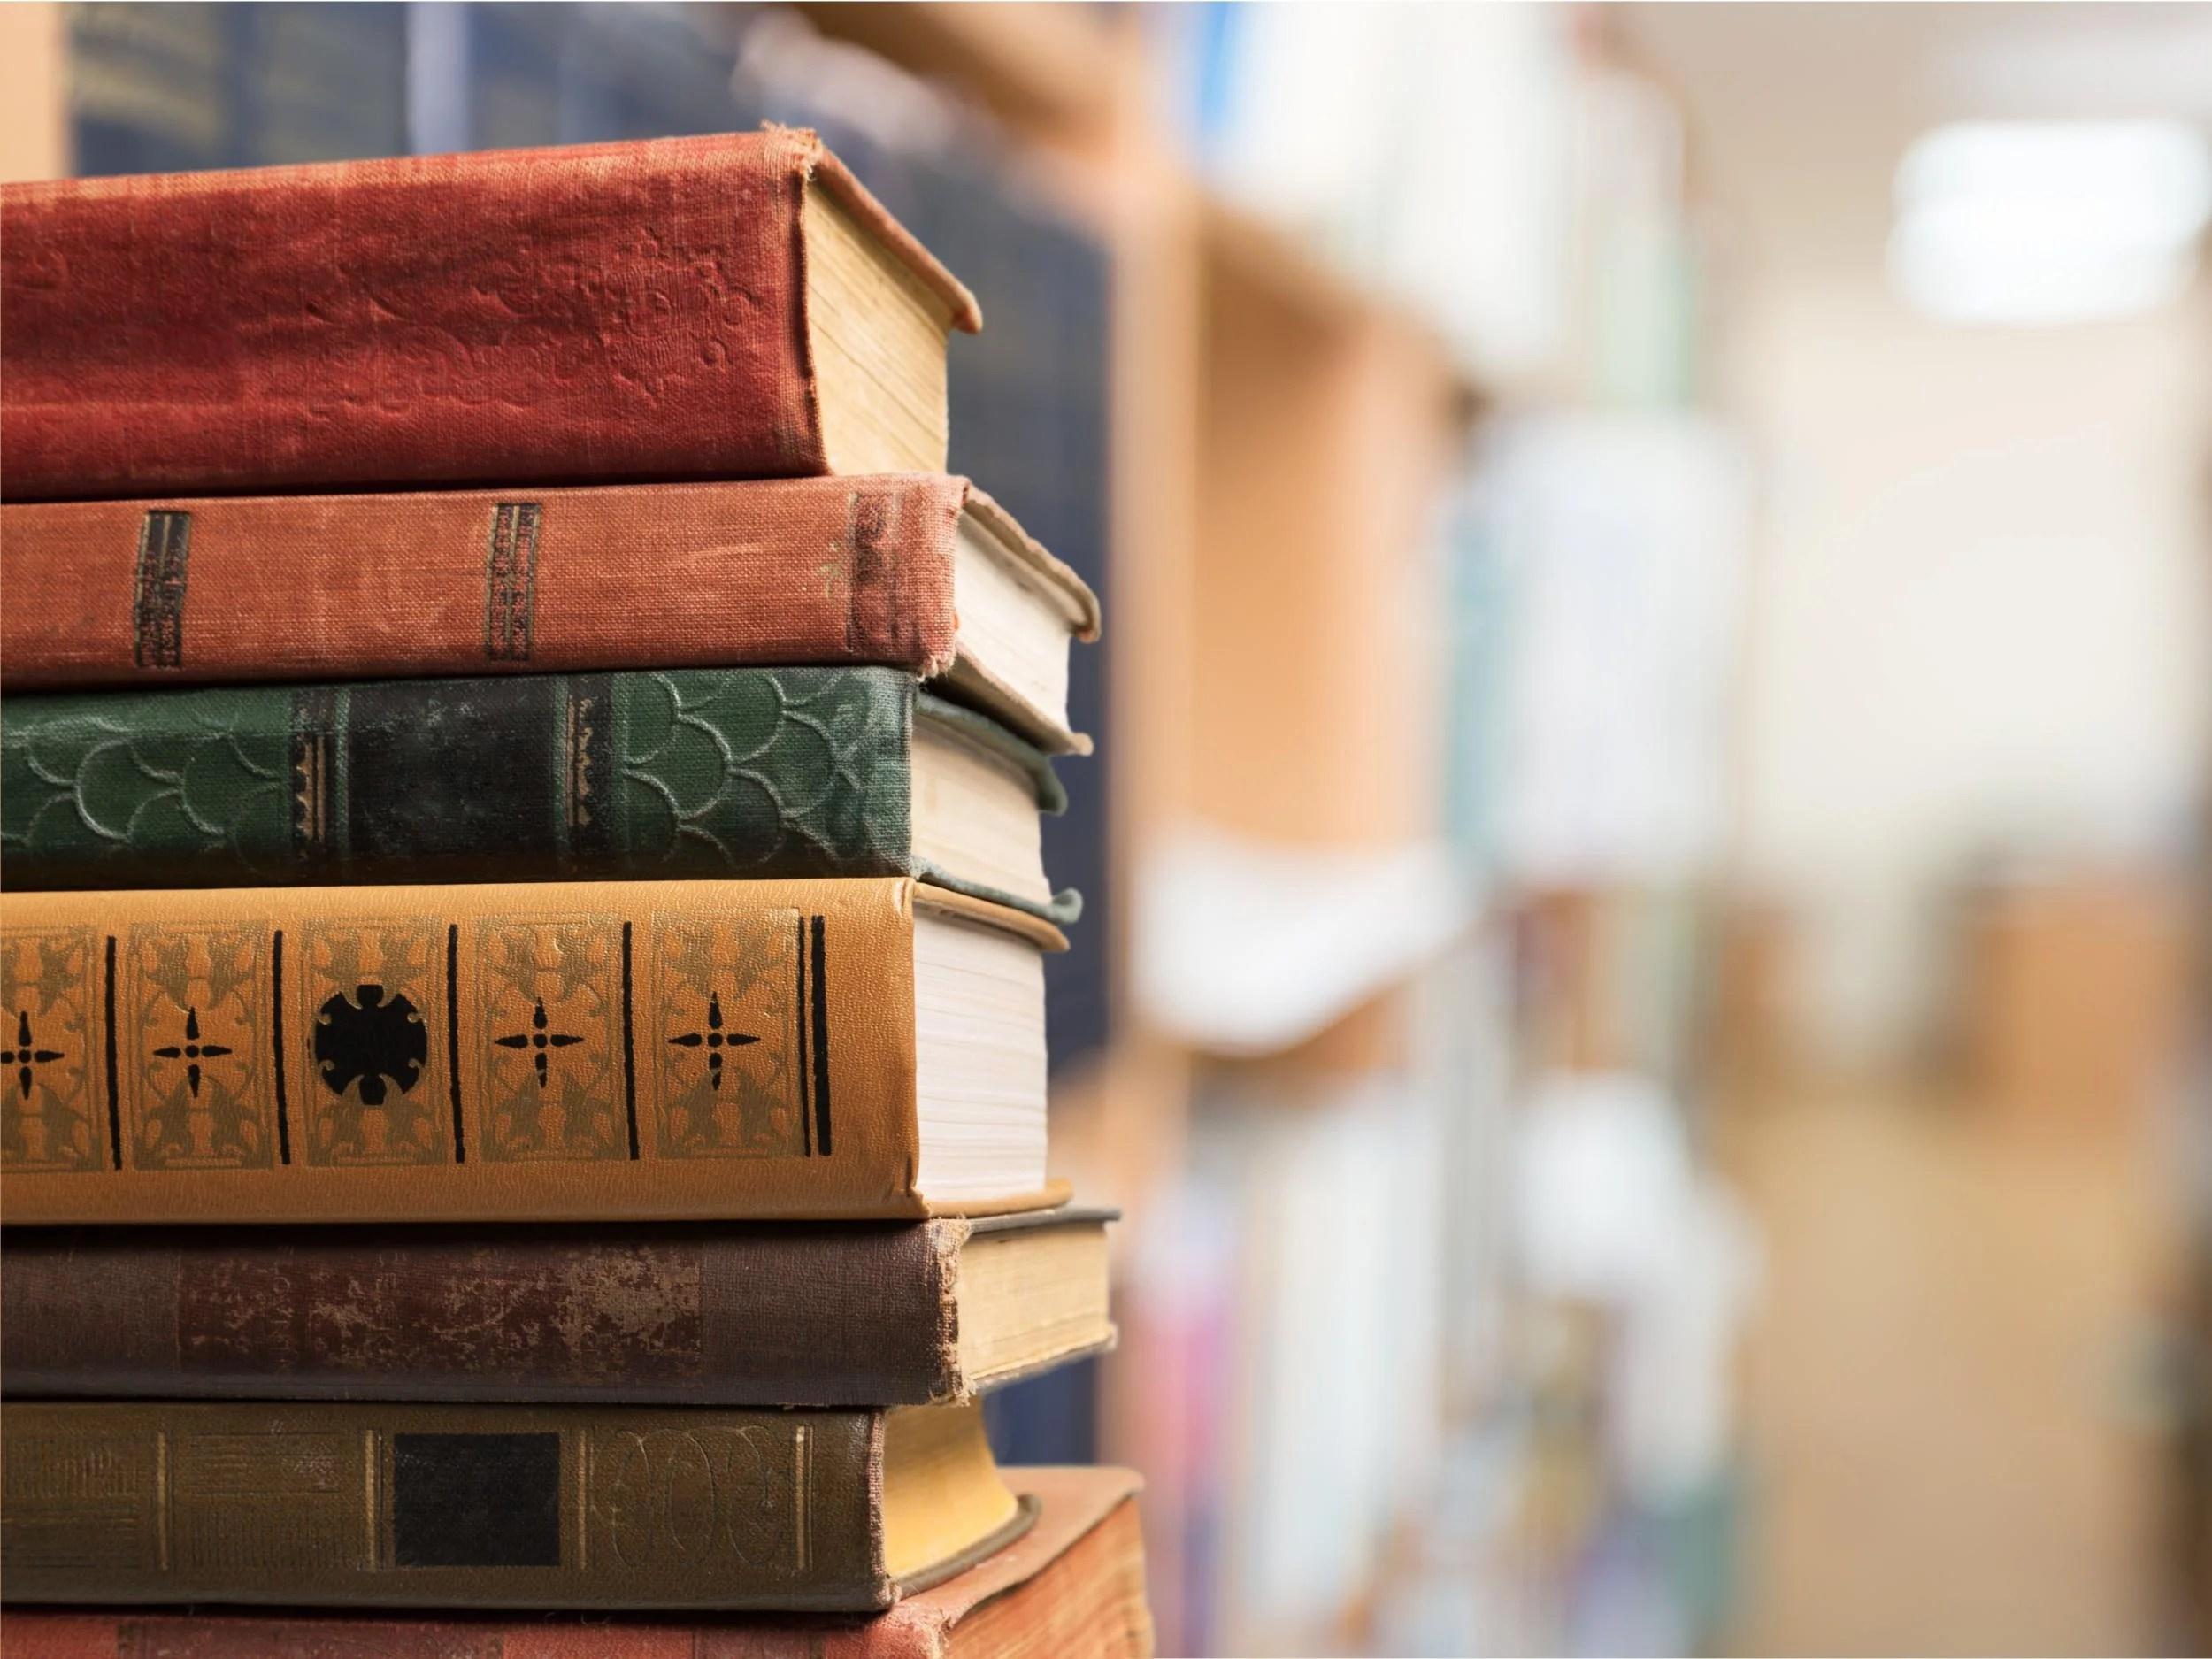 how three poisonous books